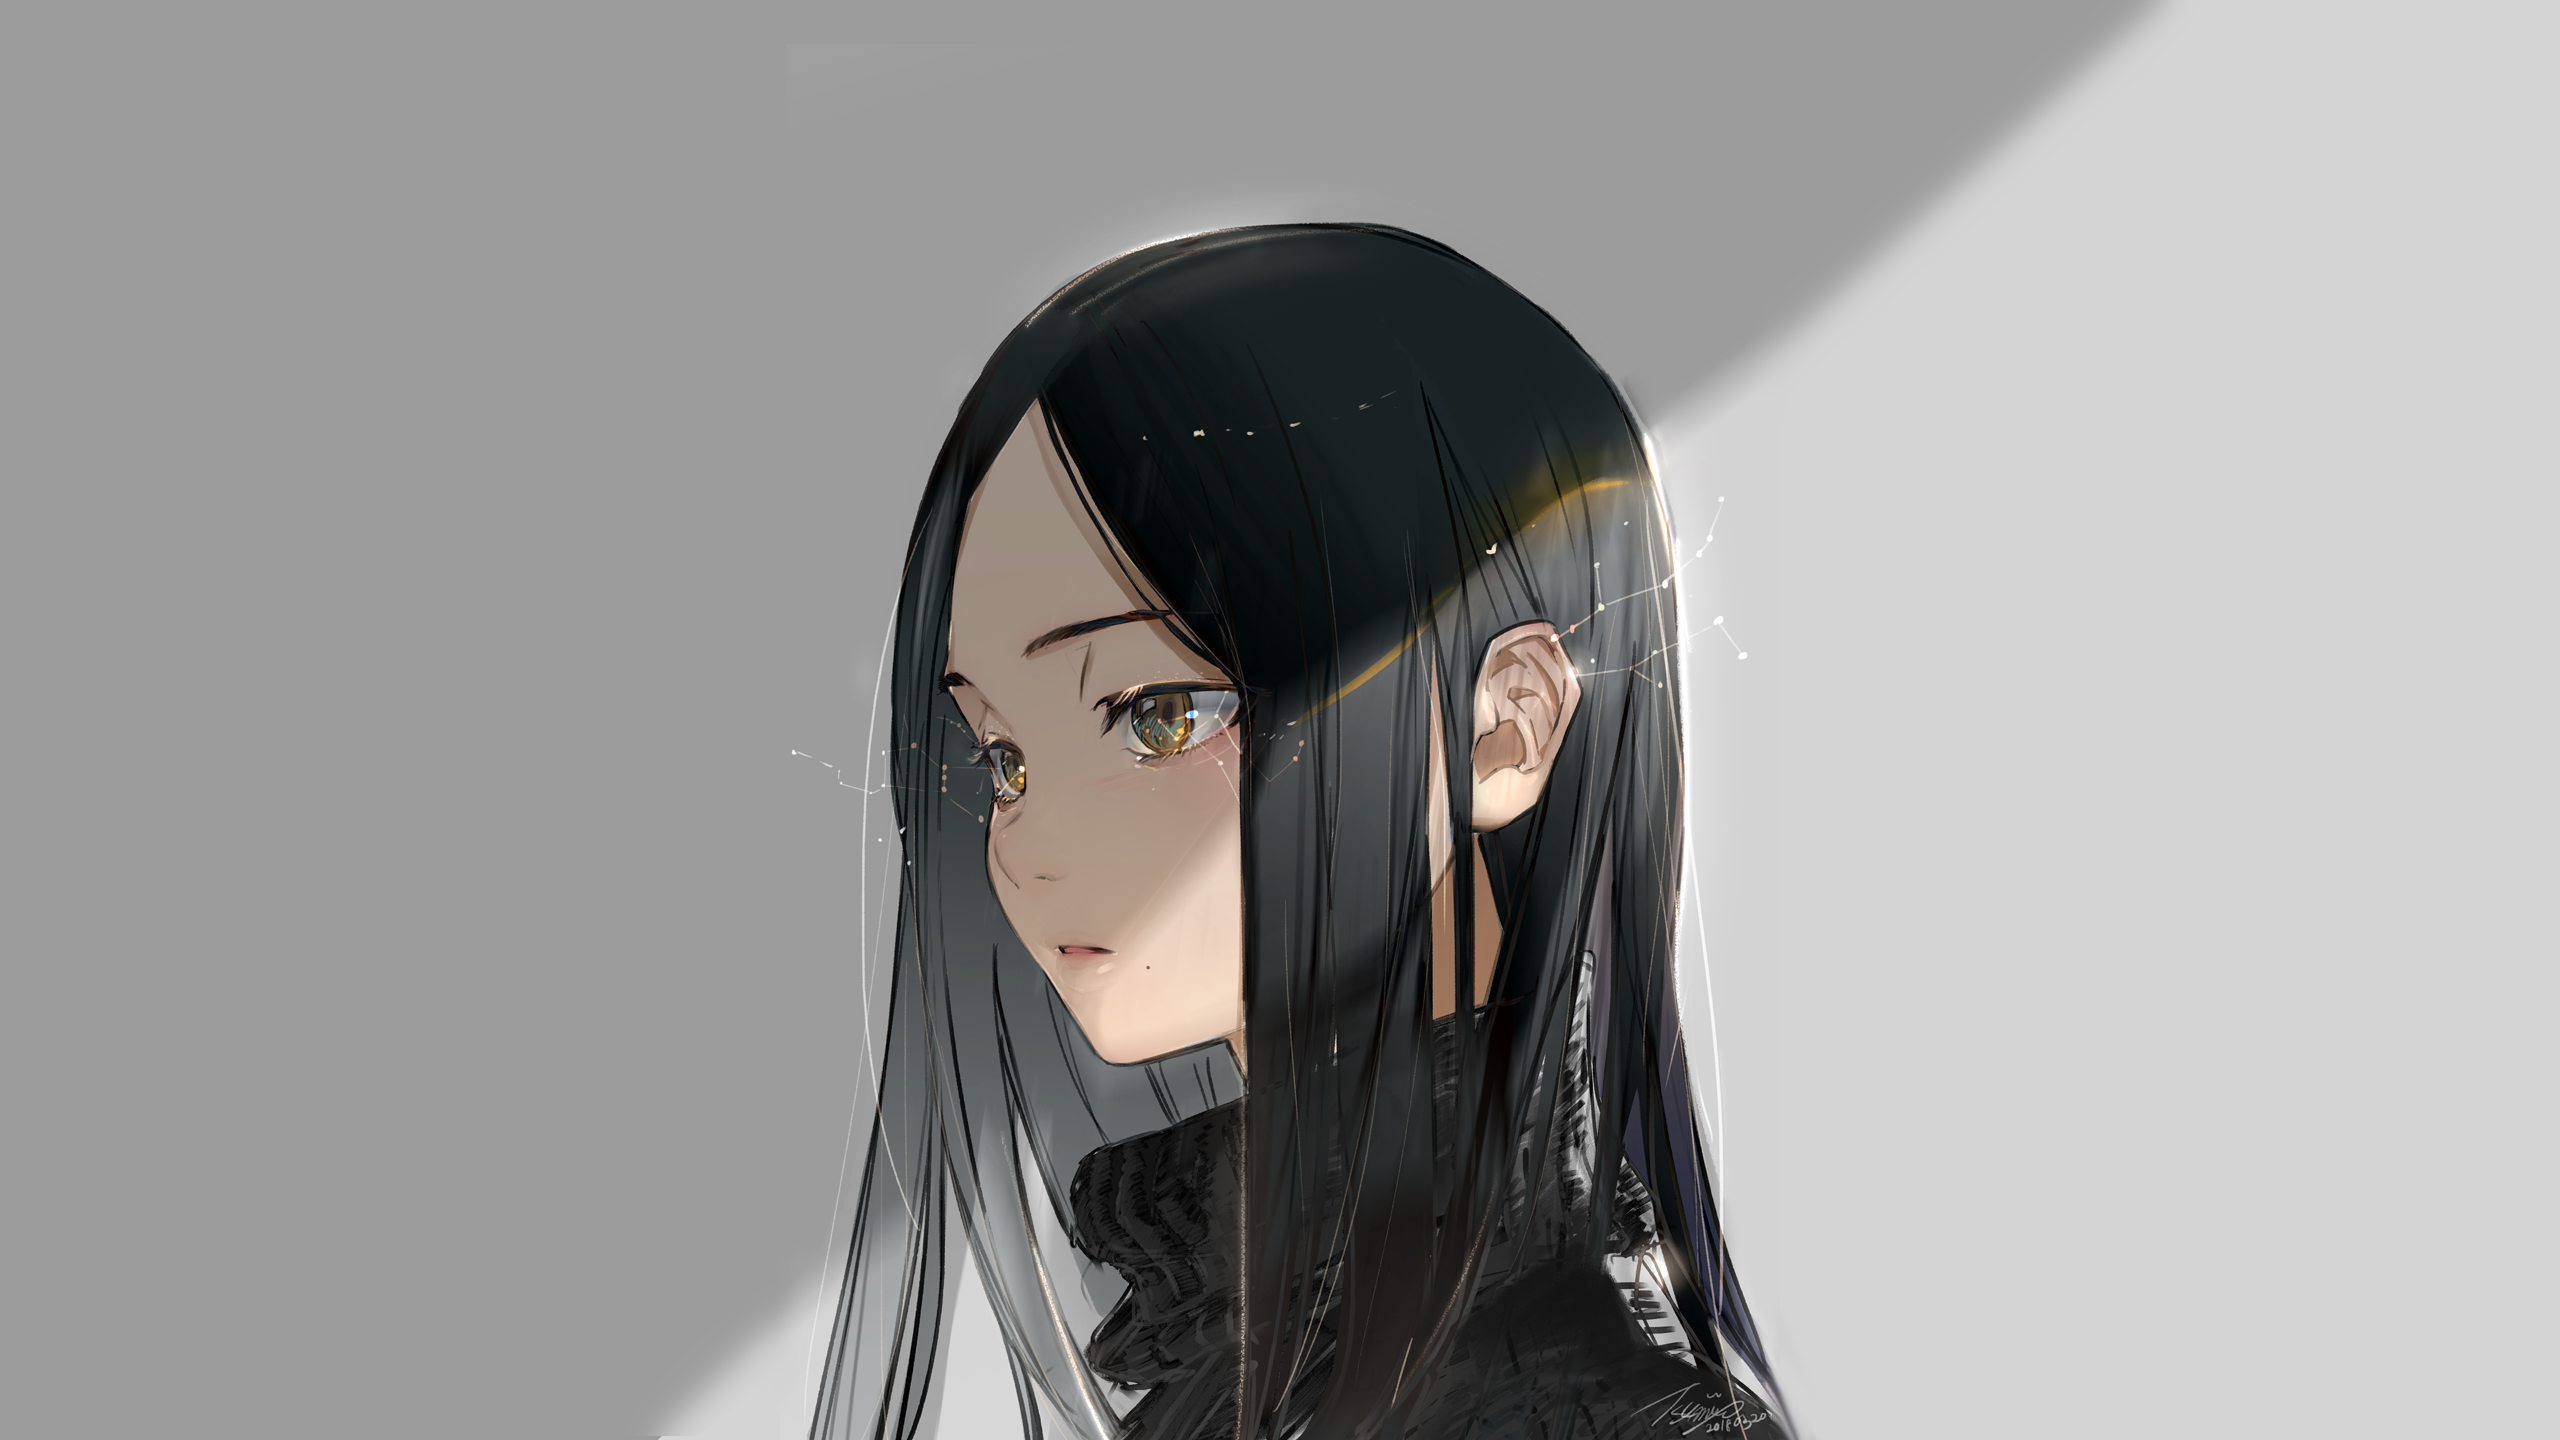 Anime 2560x1440 anime anime girls yellow eyes black hair long hair stars looking away white background light effects sweater